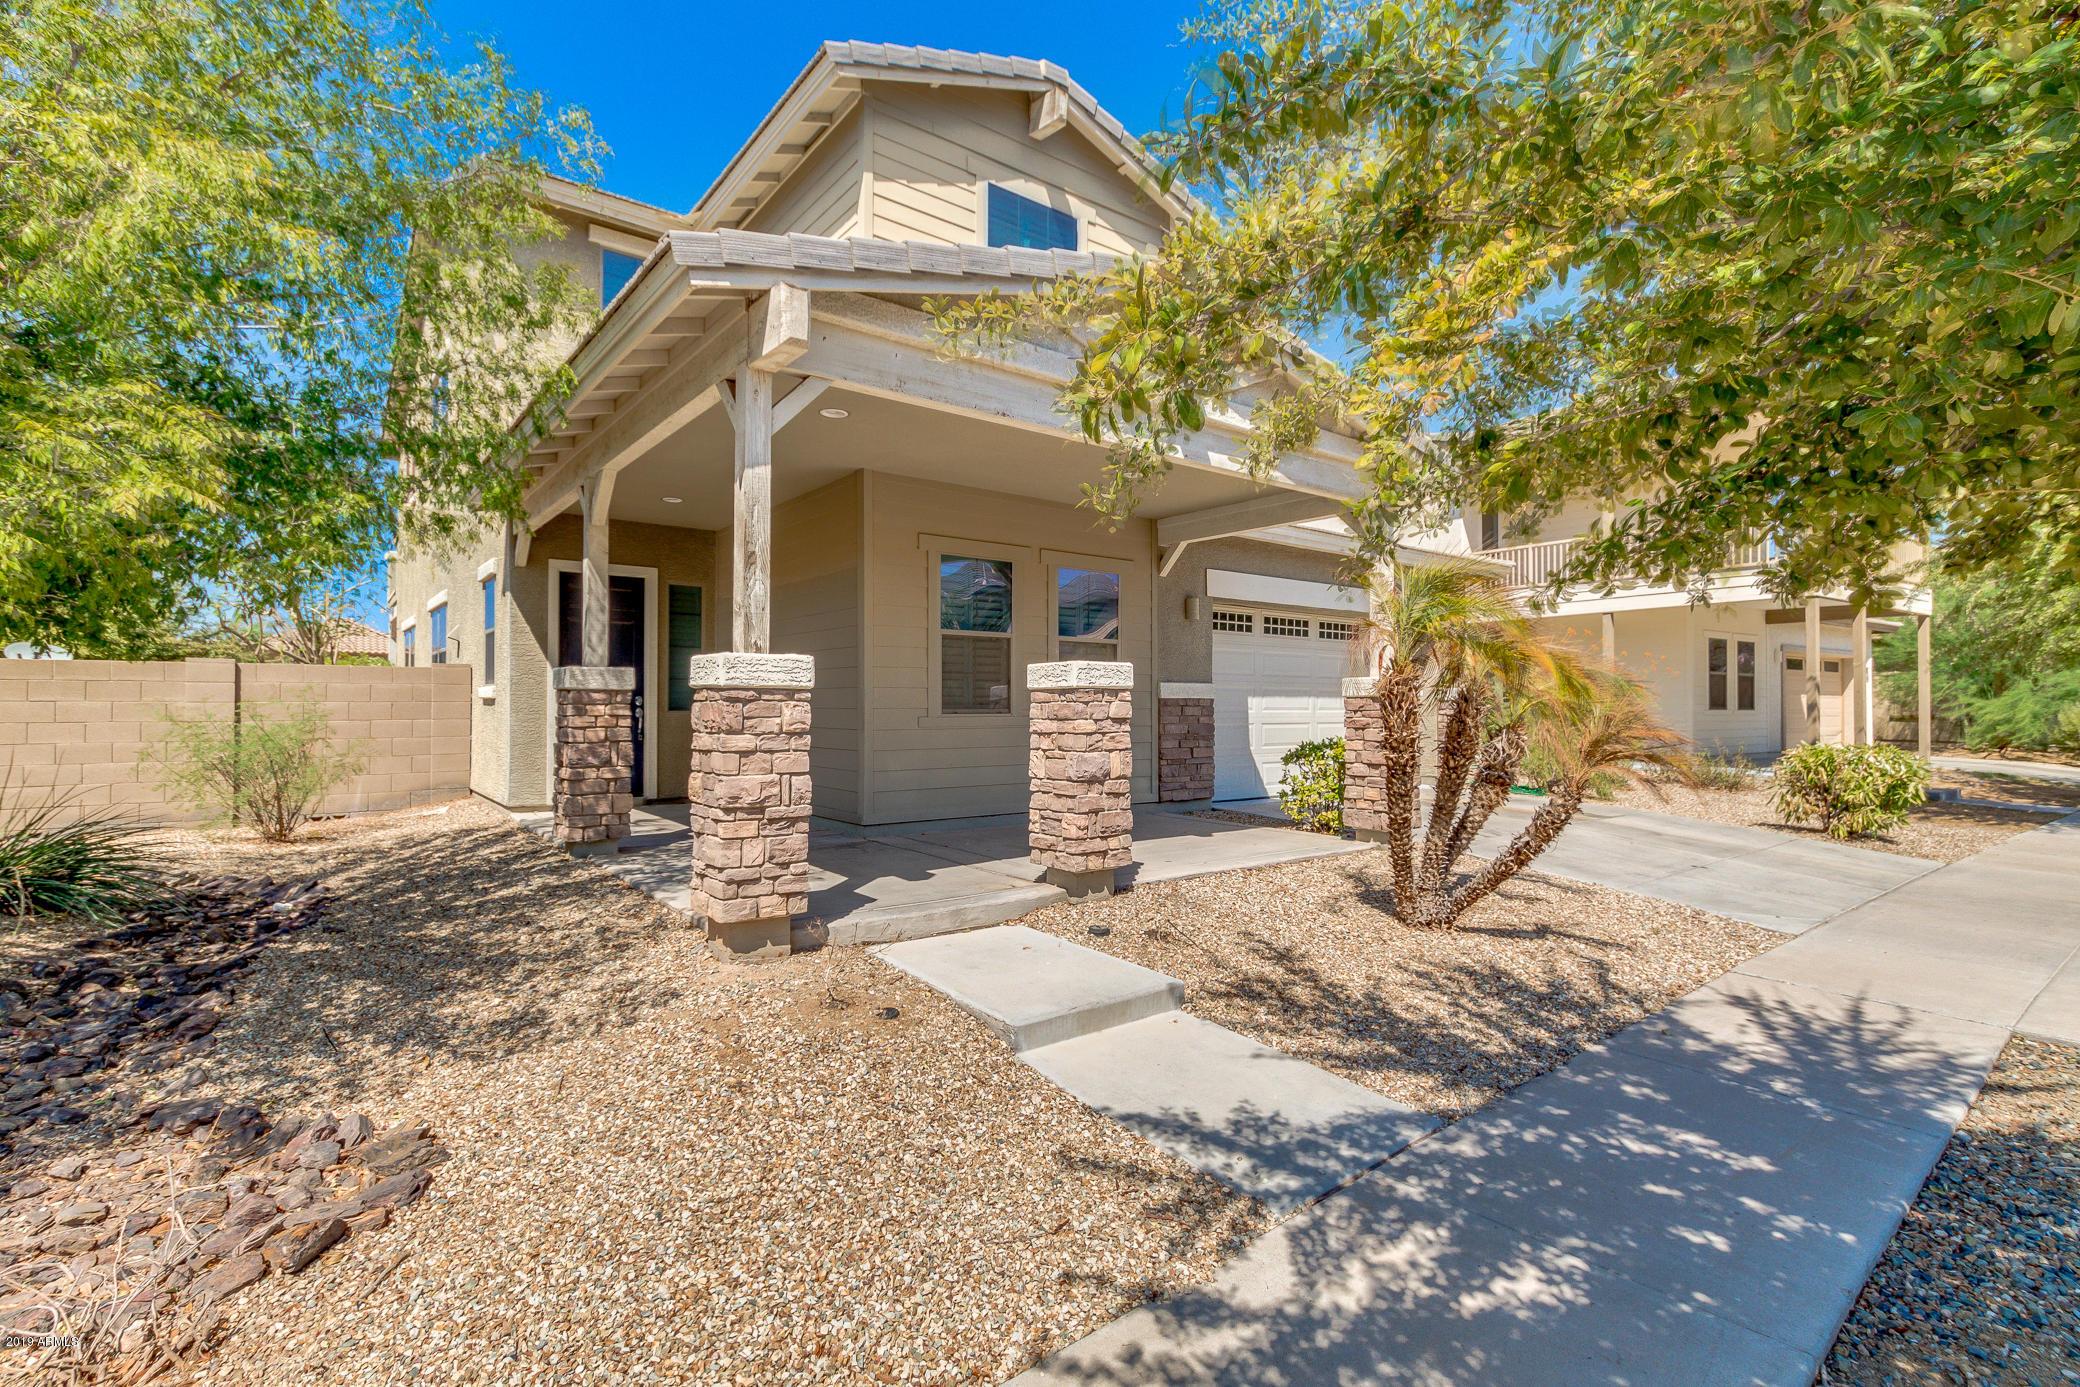 Photo of 3832 E CONSTANCE Way, Phoenix, AZ 85042